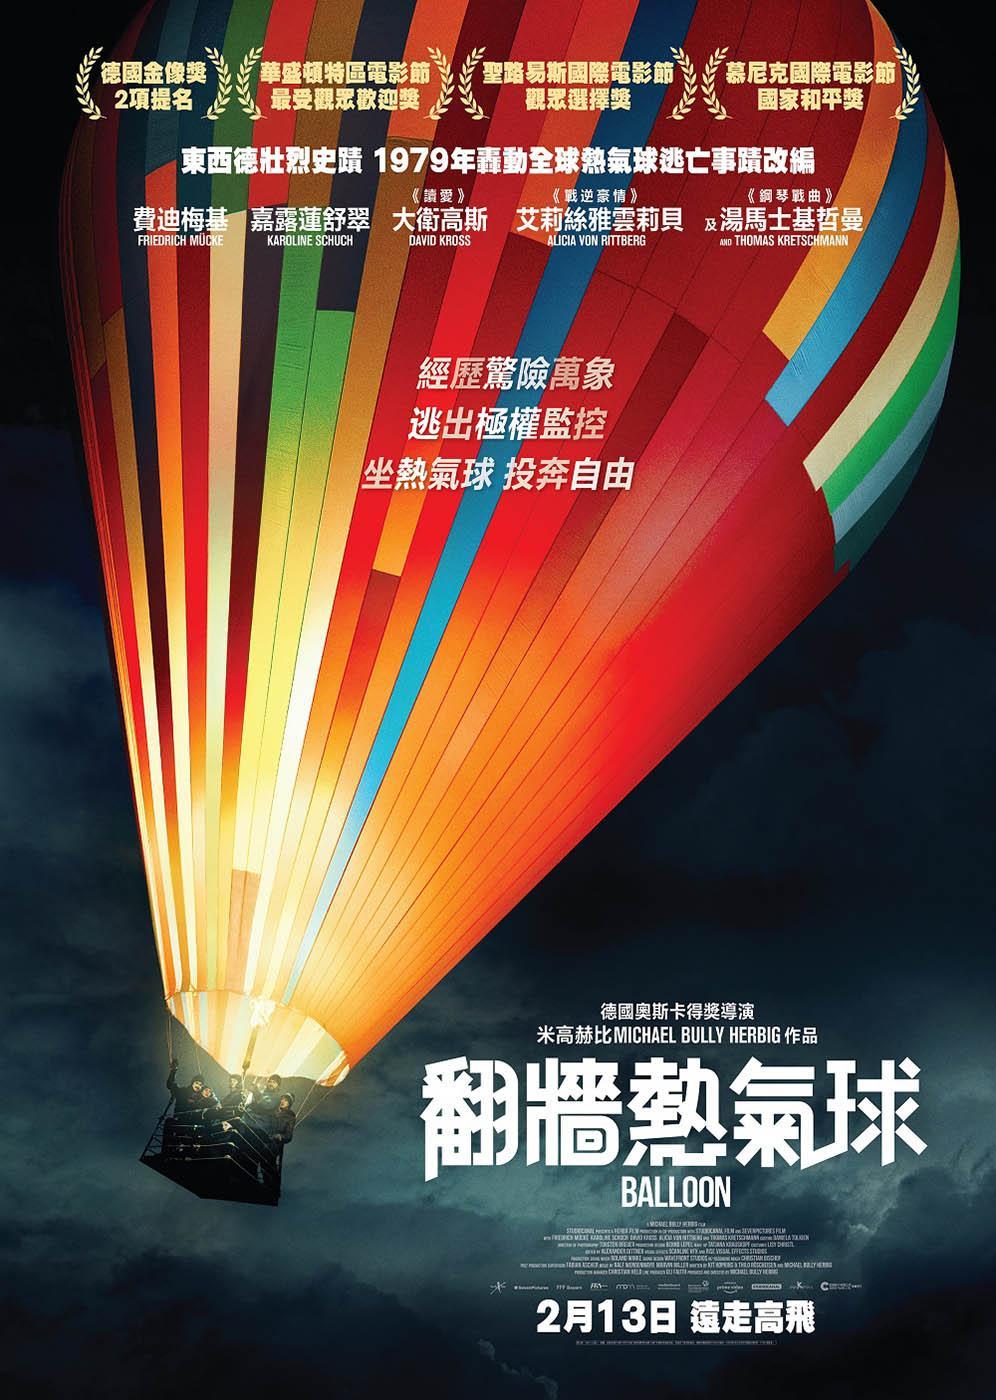 【Movie Trailer】翻牆熱氣球 - 20200130 - CELEBRITY - 明報OL網